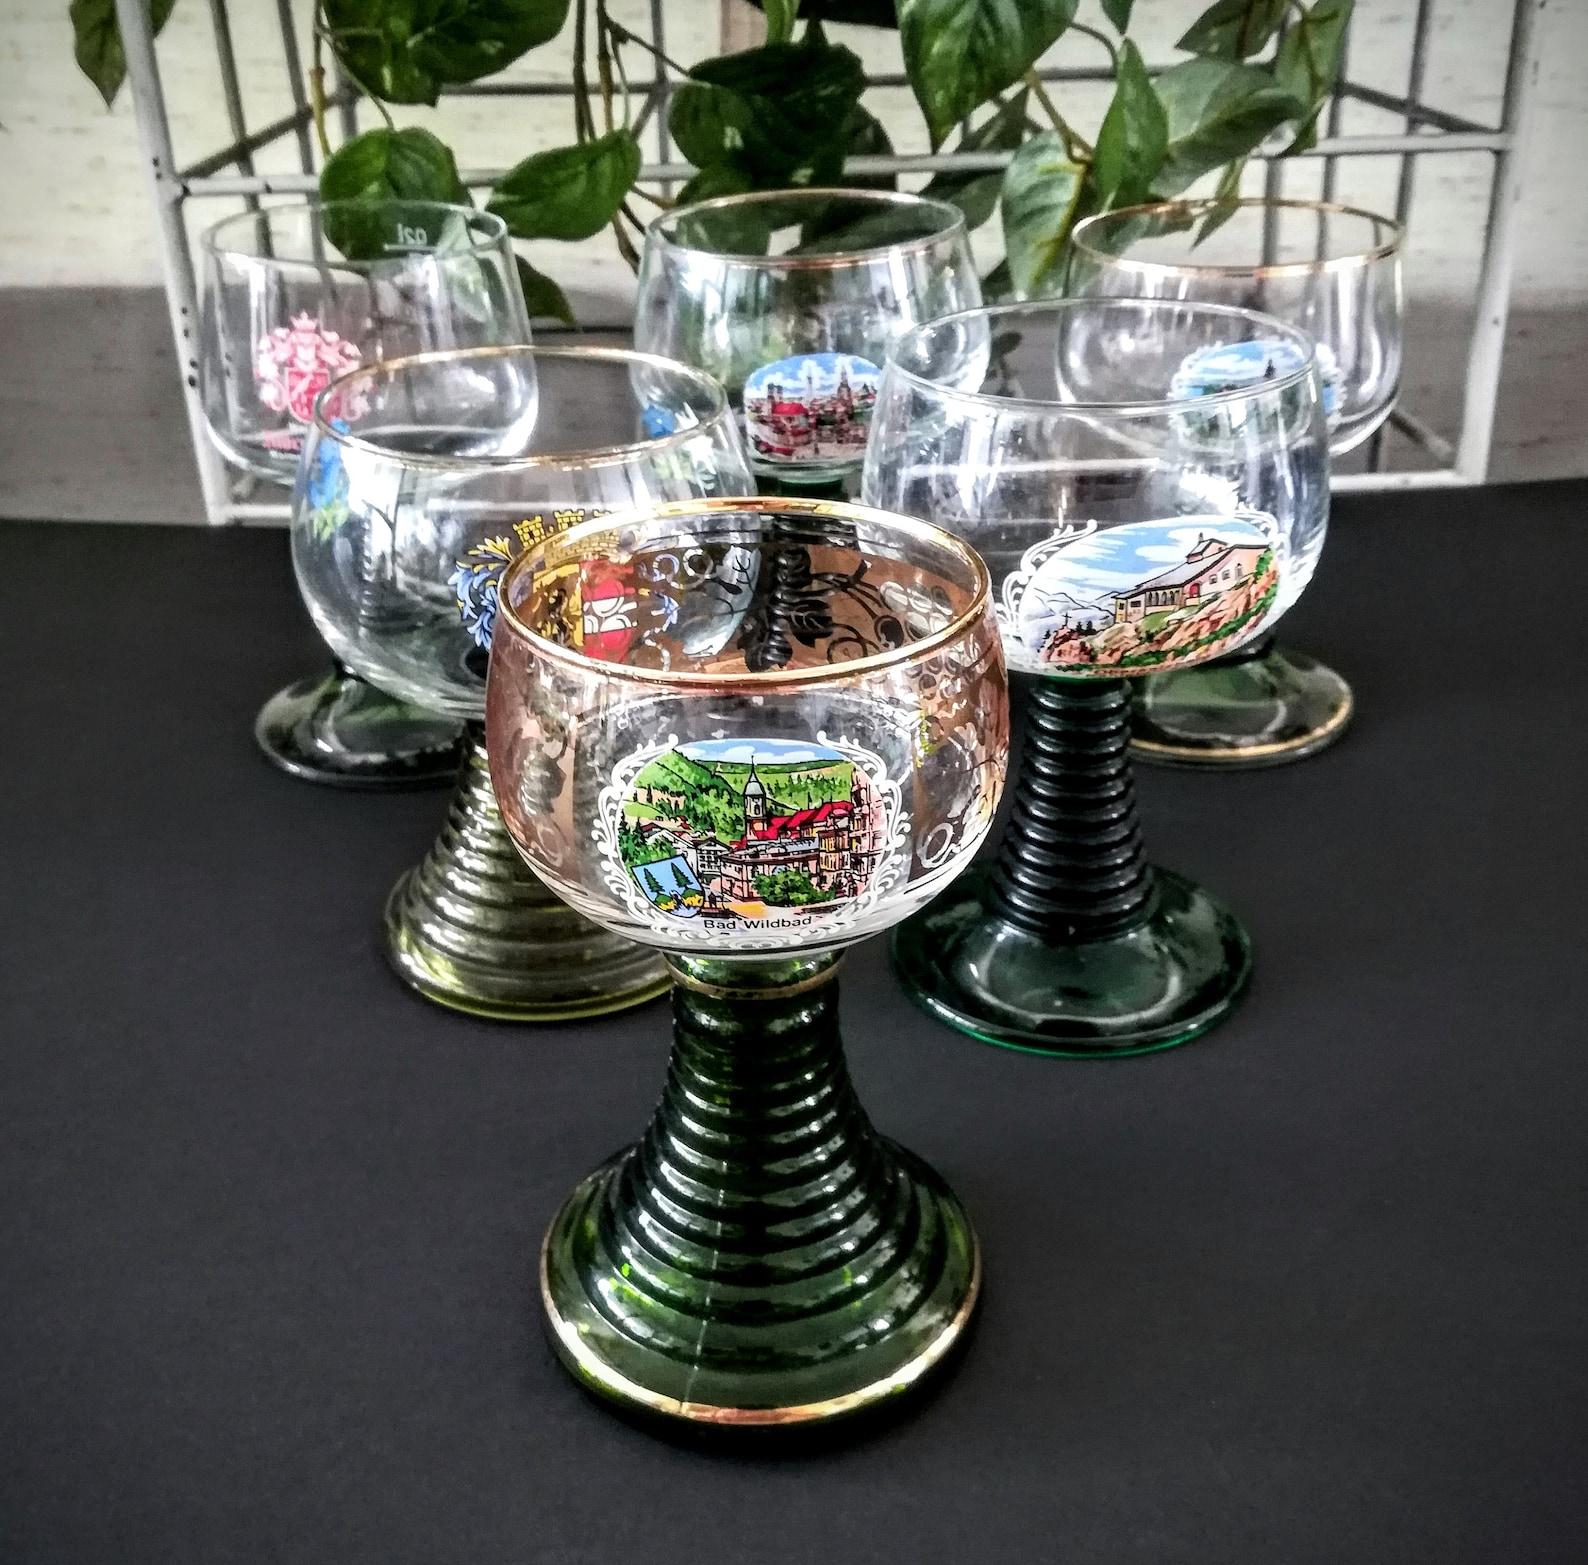 German Roemer gold leaf souvenir wine glasses